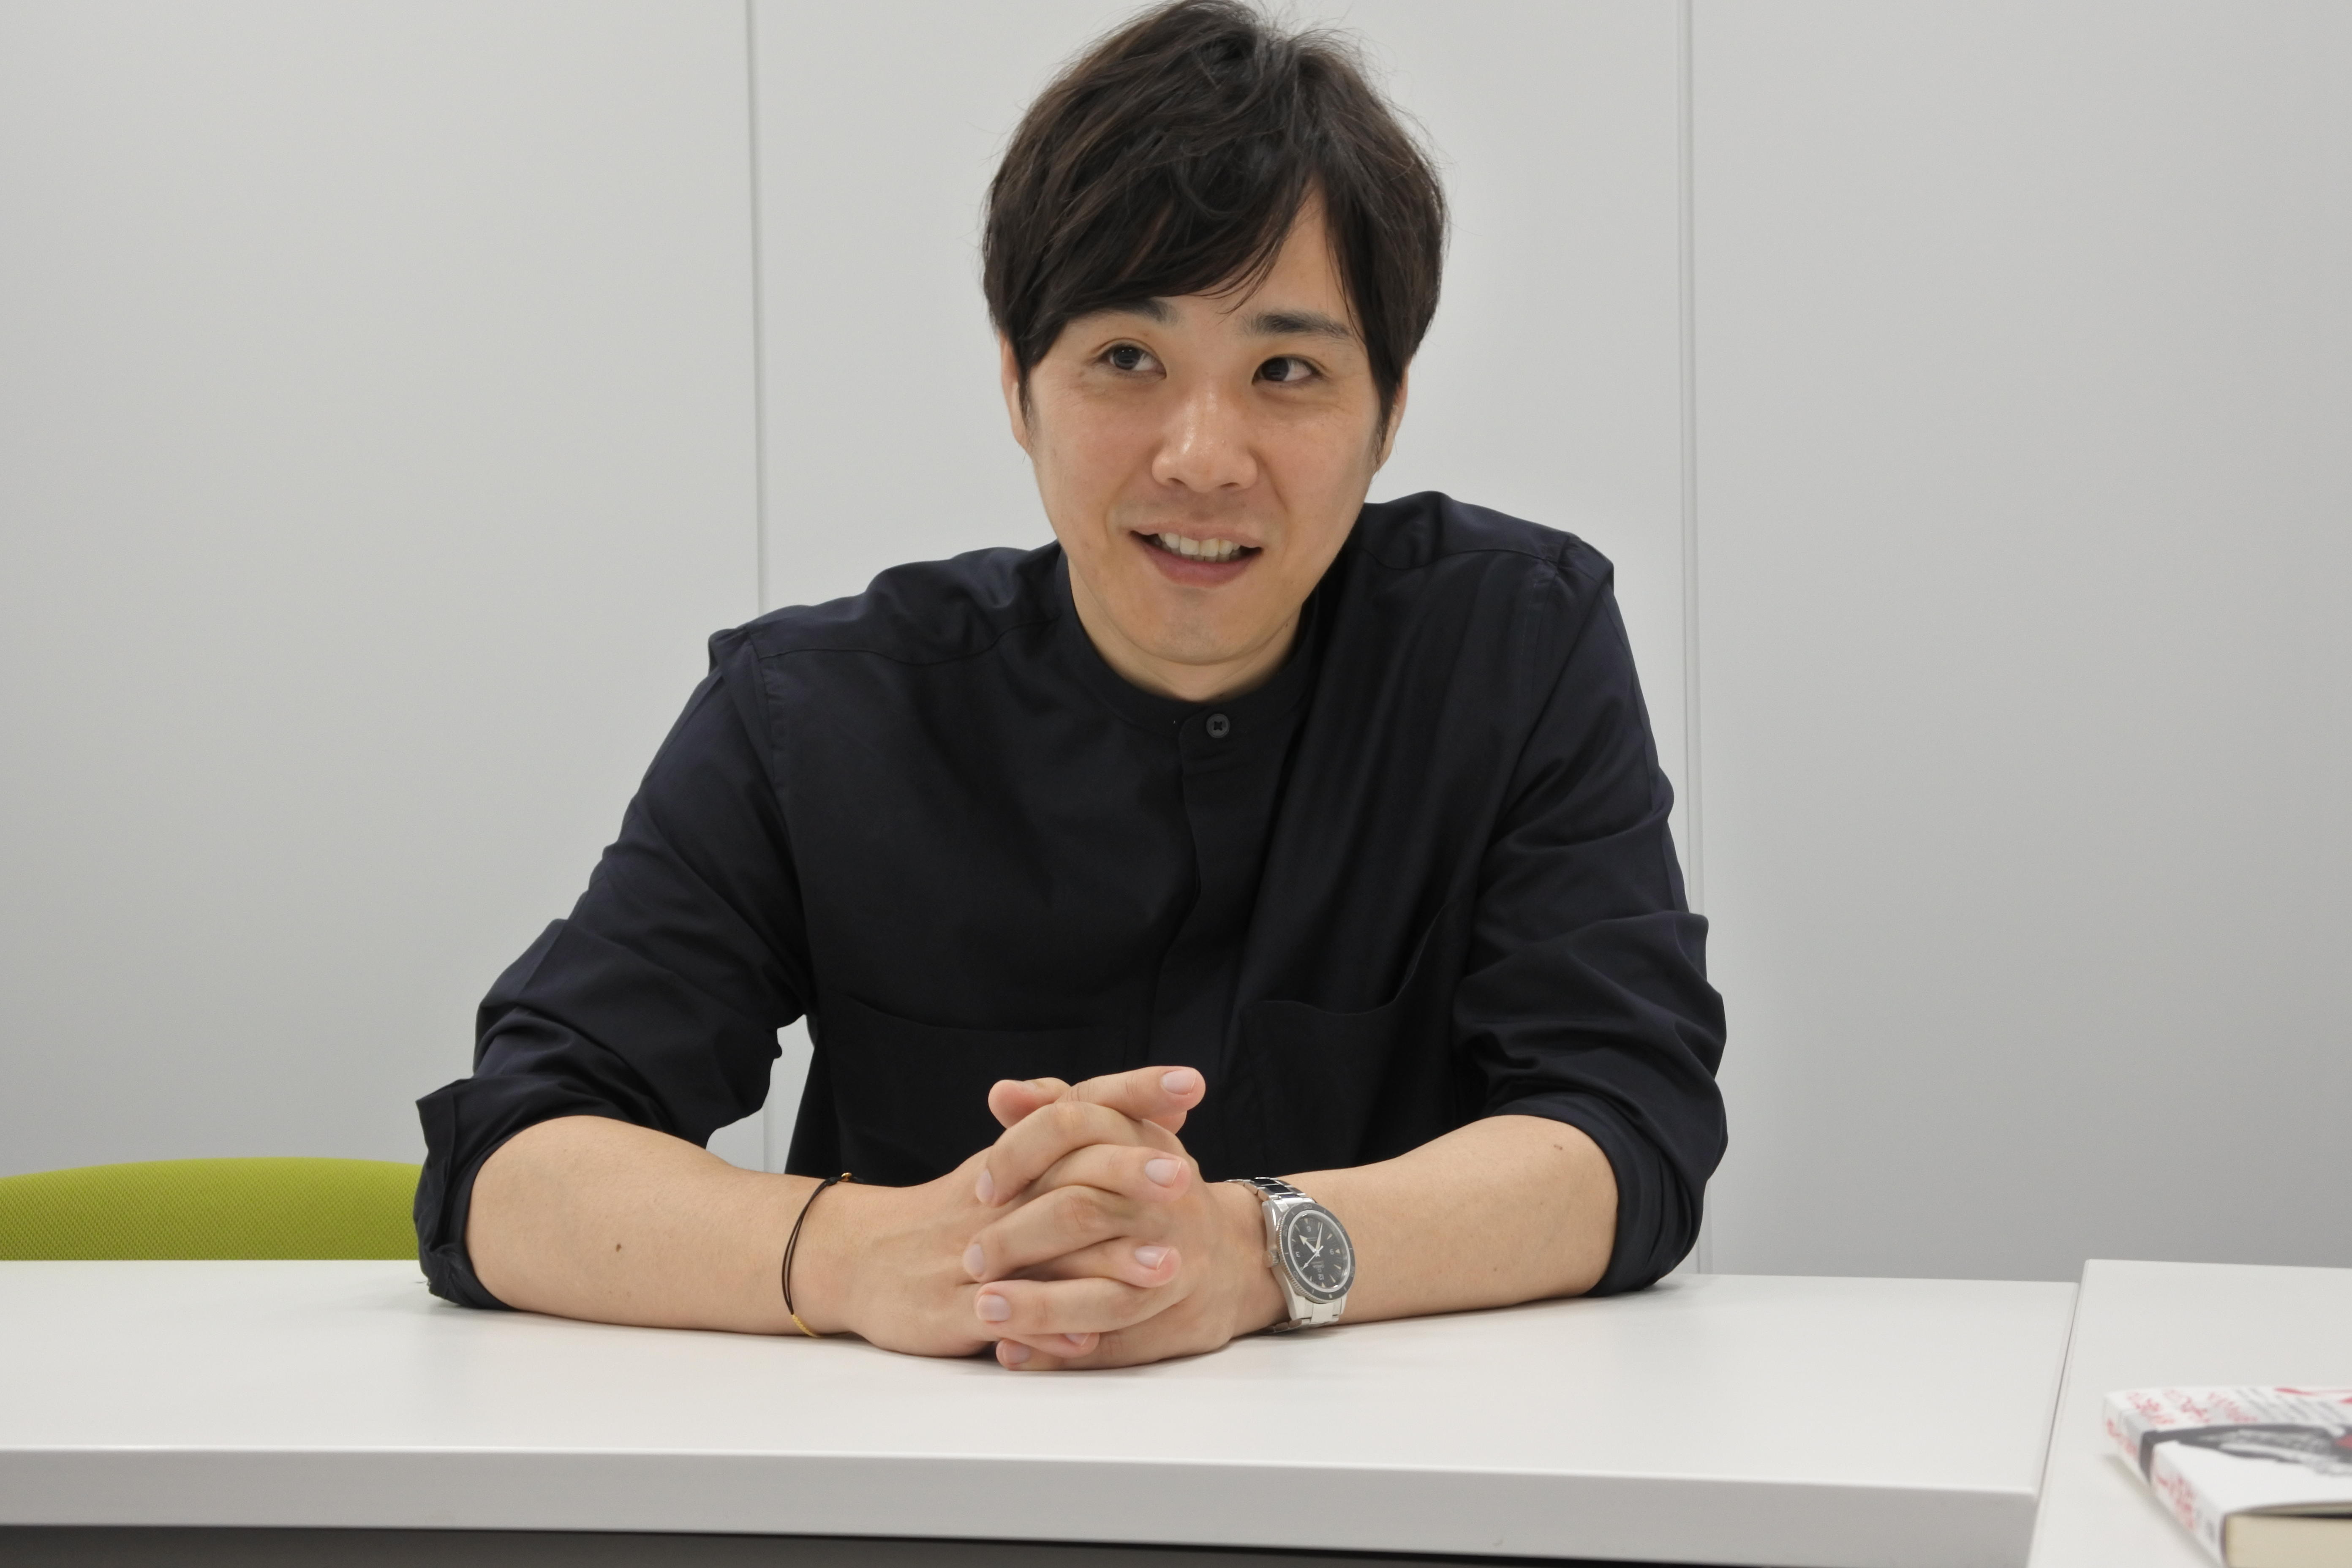 http://news.yoshimoto.co.jp/20170915101148-6ad00158a7a7fc4d8fd068966bf871e8c419b8e1.jpg